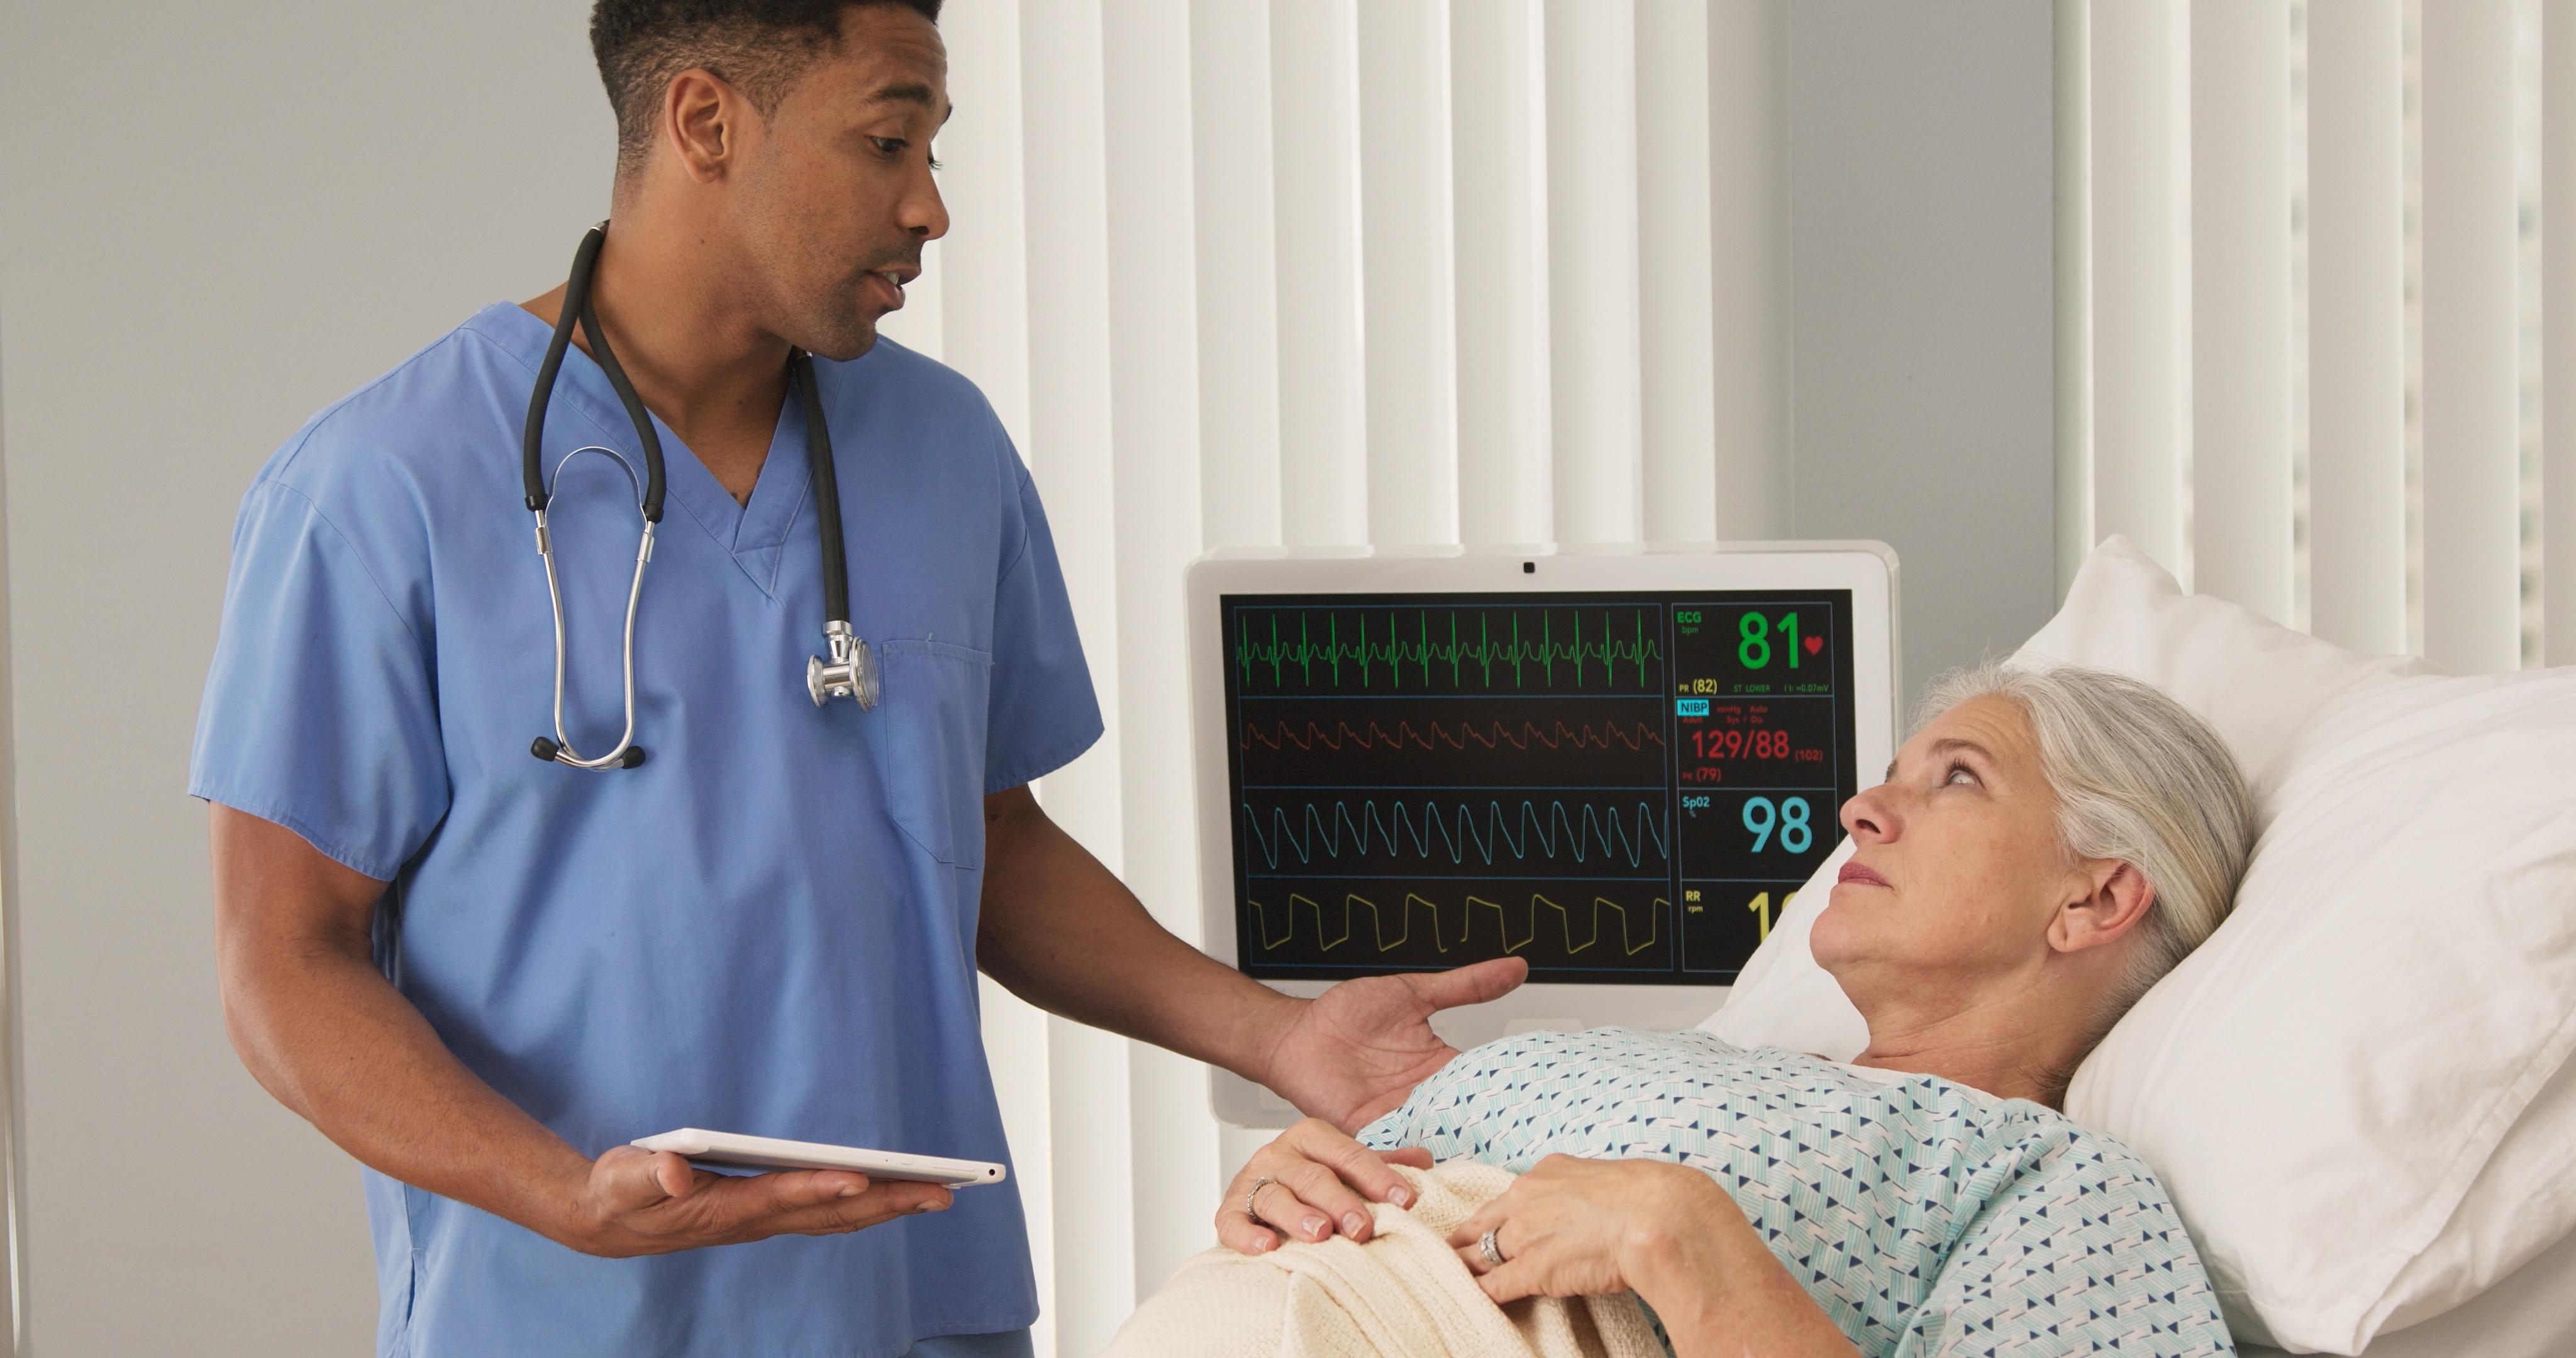 6 Good Reasons For Becoming An Ekg Technician Medcerts